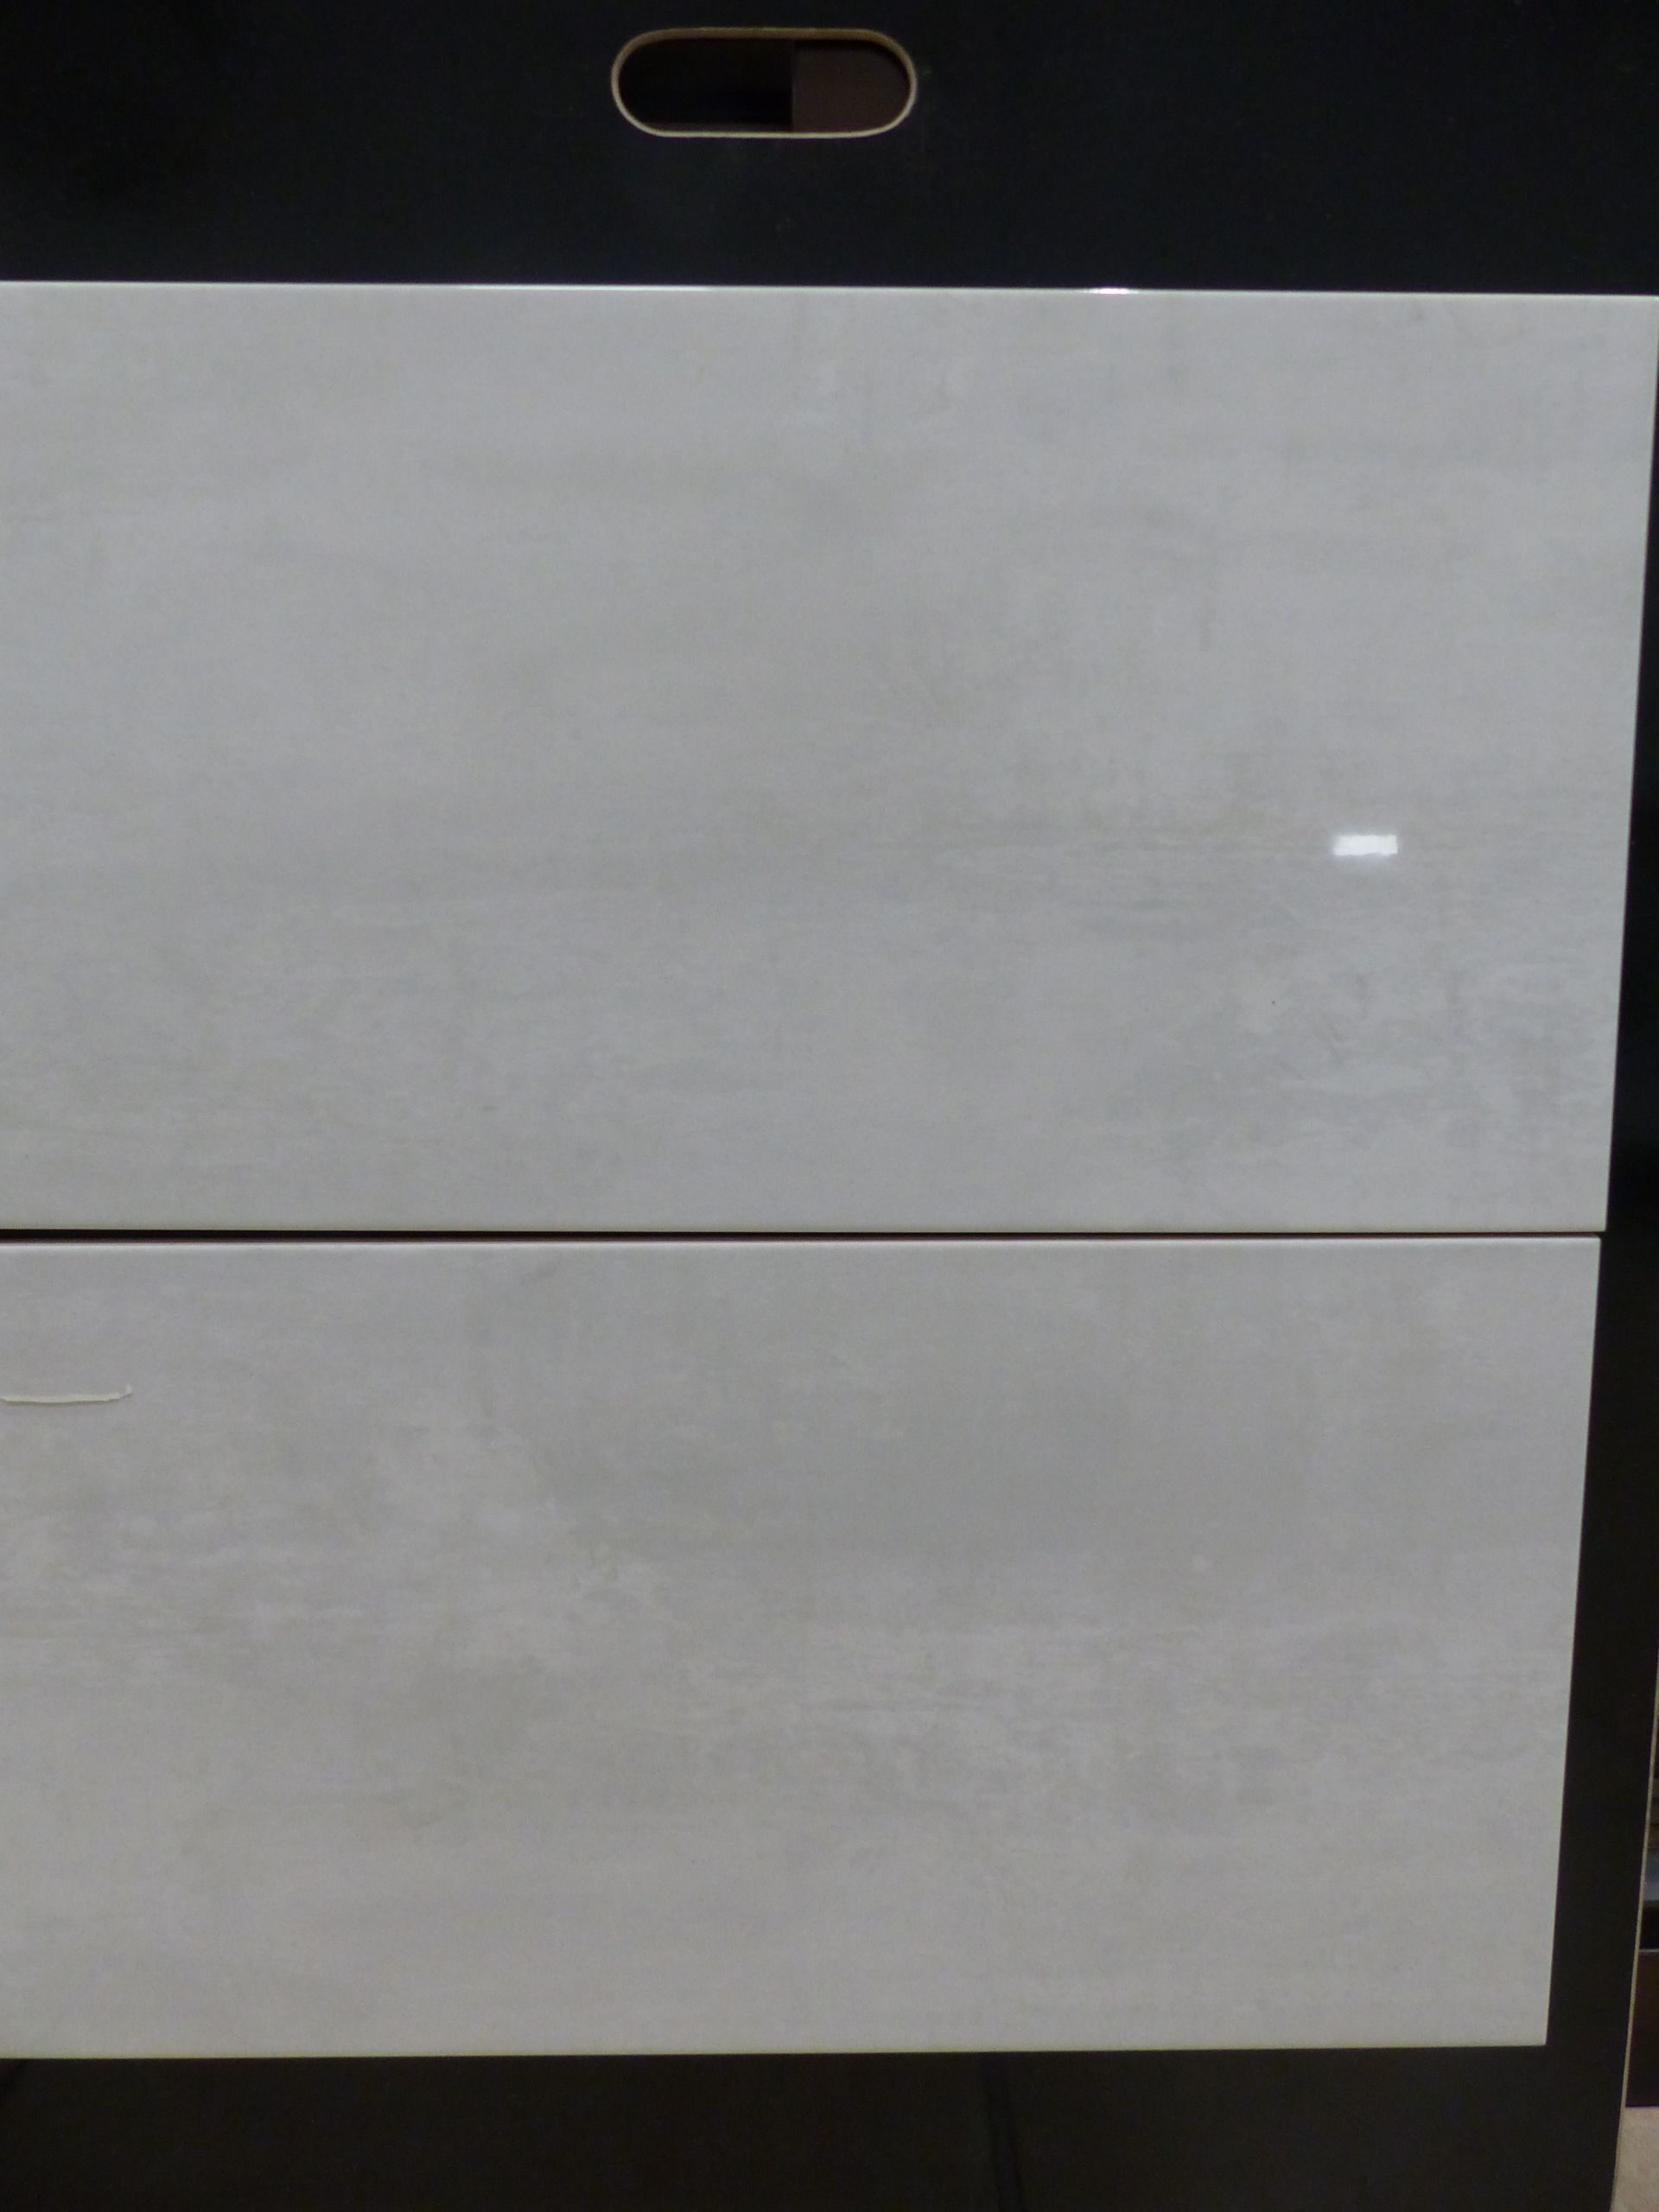 Au Comptoir Du Carrelage comptoir du carrelage ptoir du carrelage colomiers zorggemak